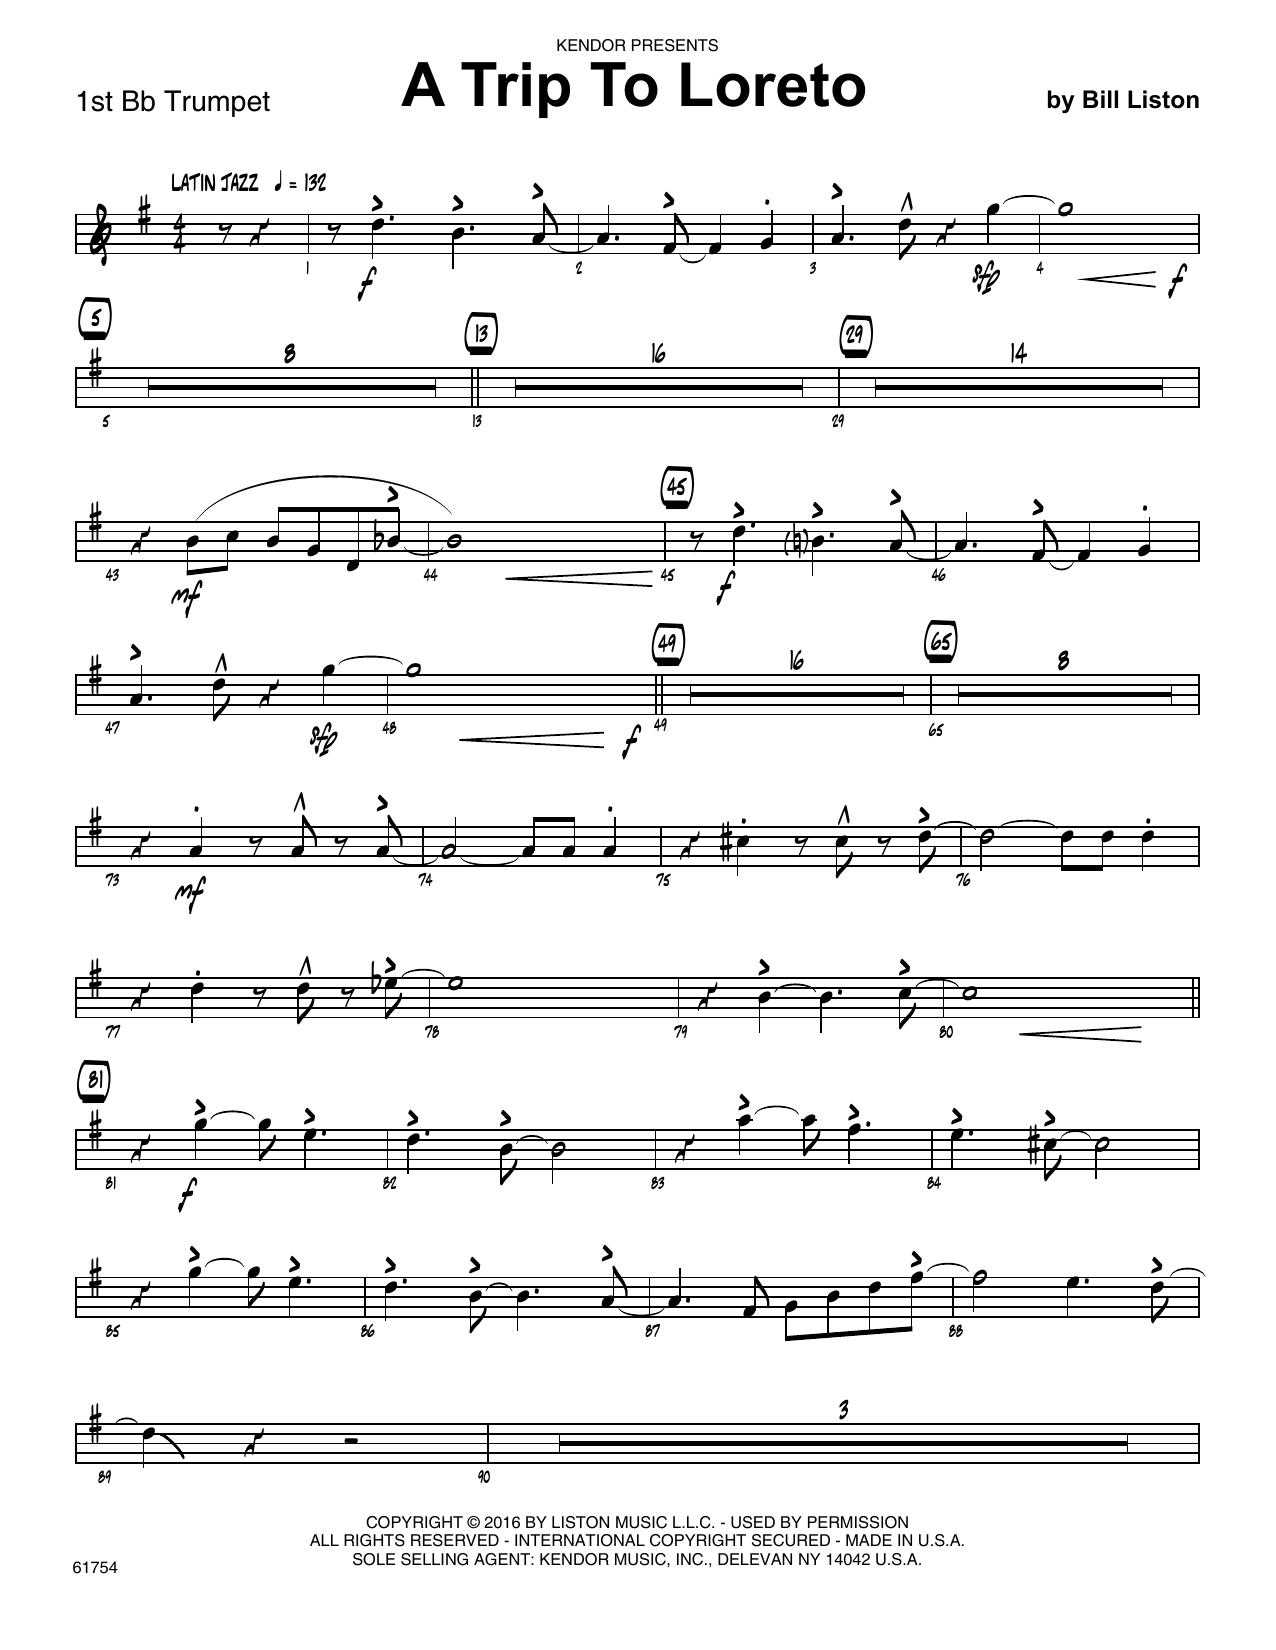 A Trip To Loreto - 1st Bb Trumpet Sheet Music